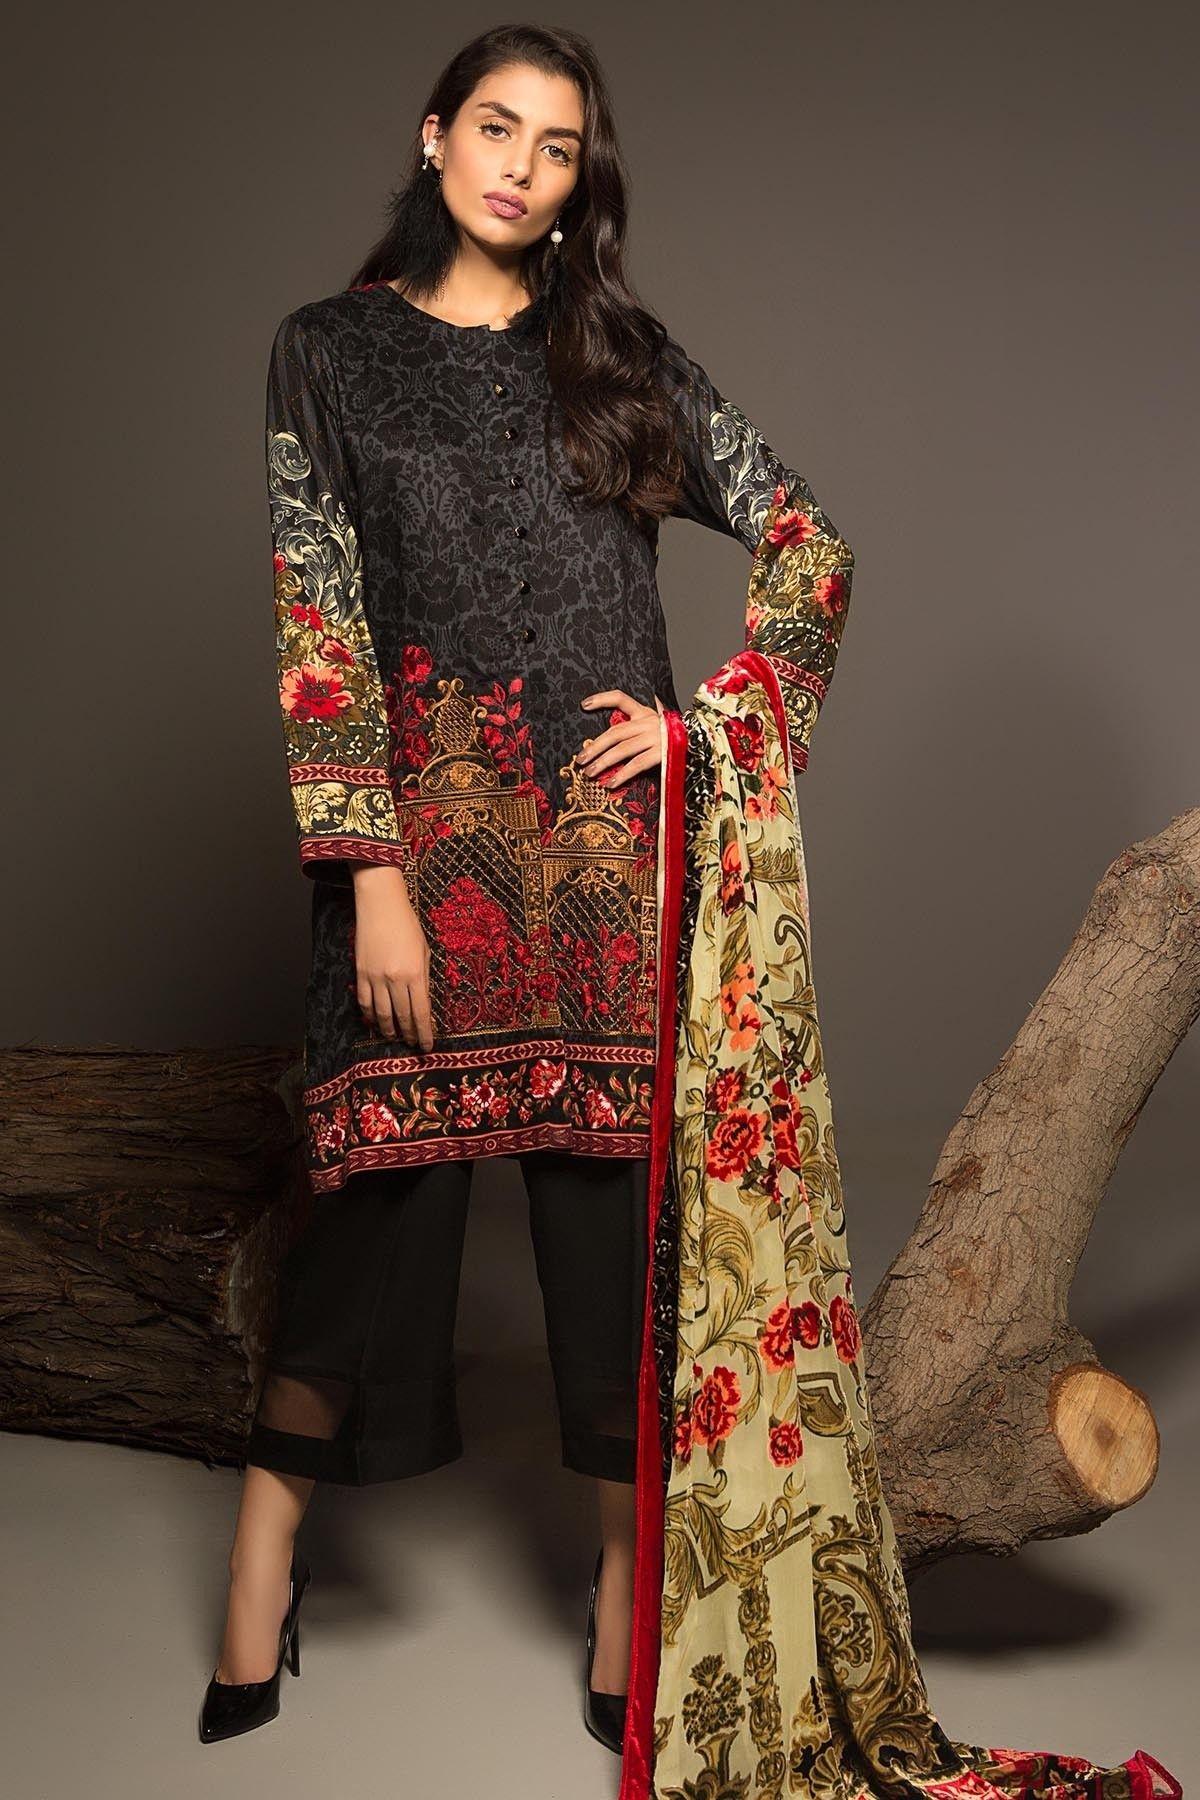 Pakistan fashion design 2018